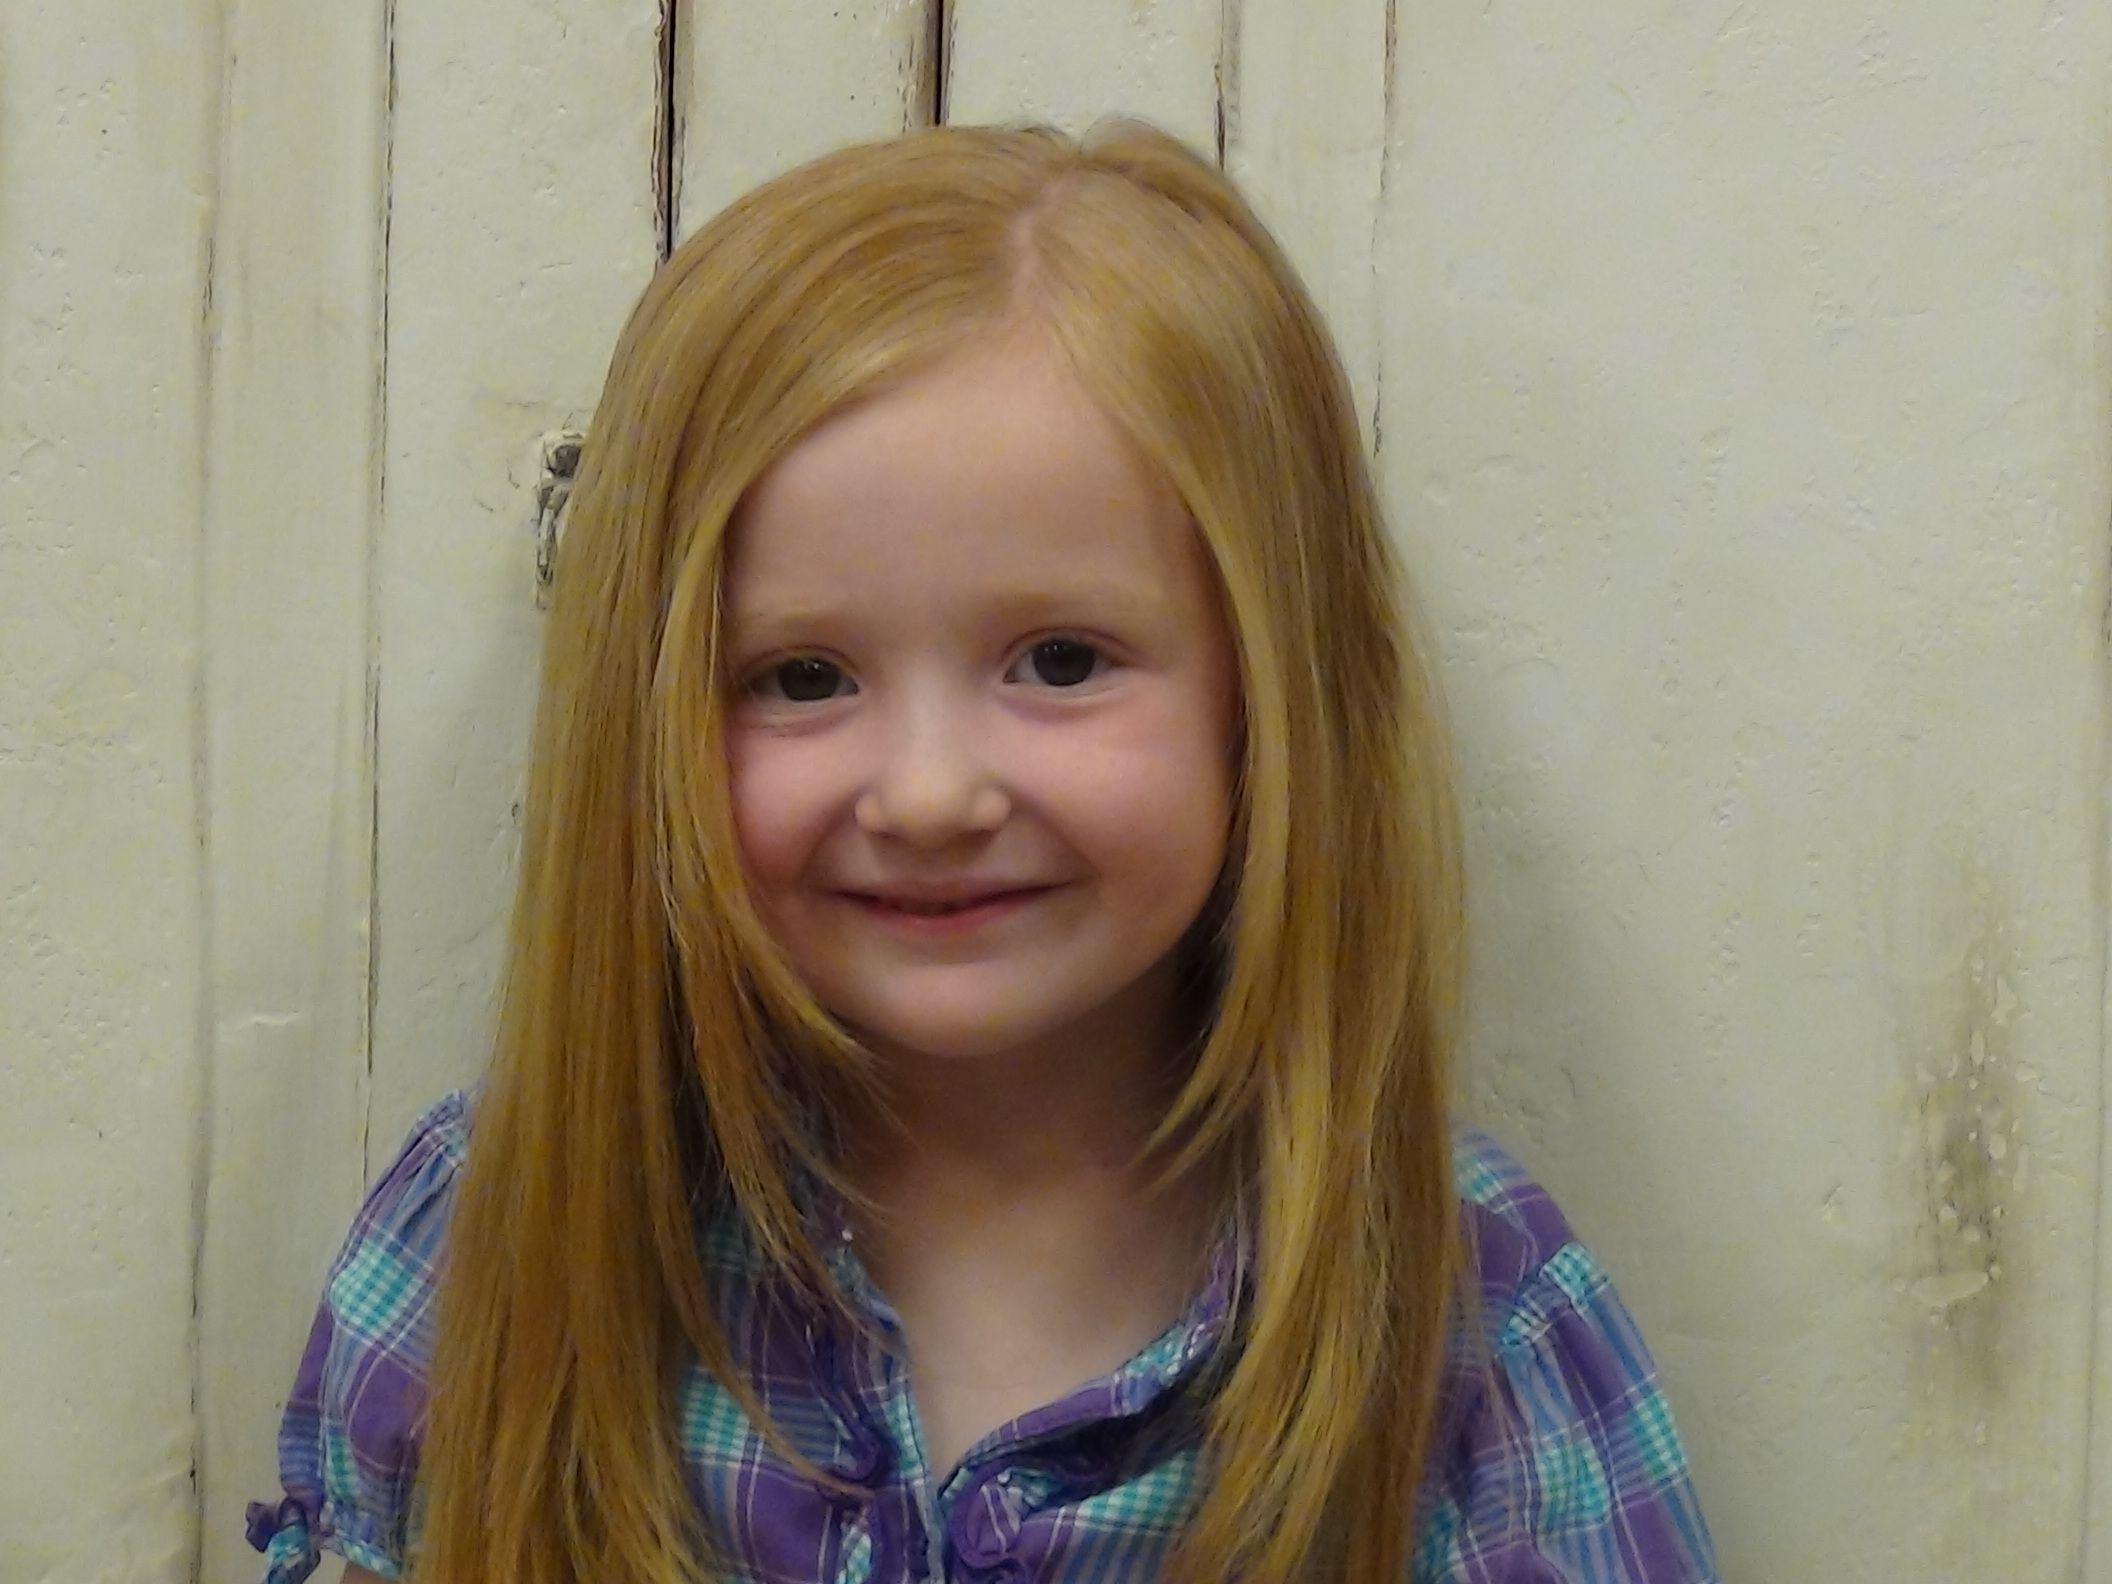 Tremendous 1000 Images About Kid Hair On Pinterest Short Hairstyles Gunalazisus